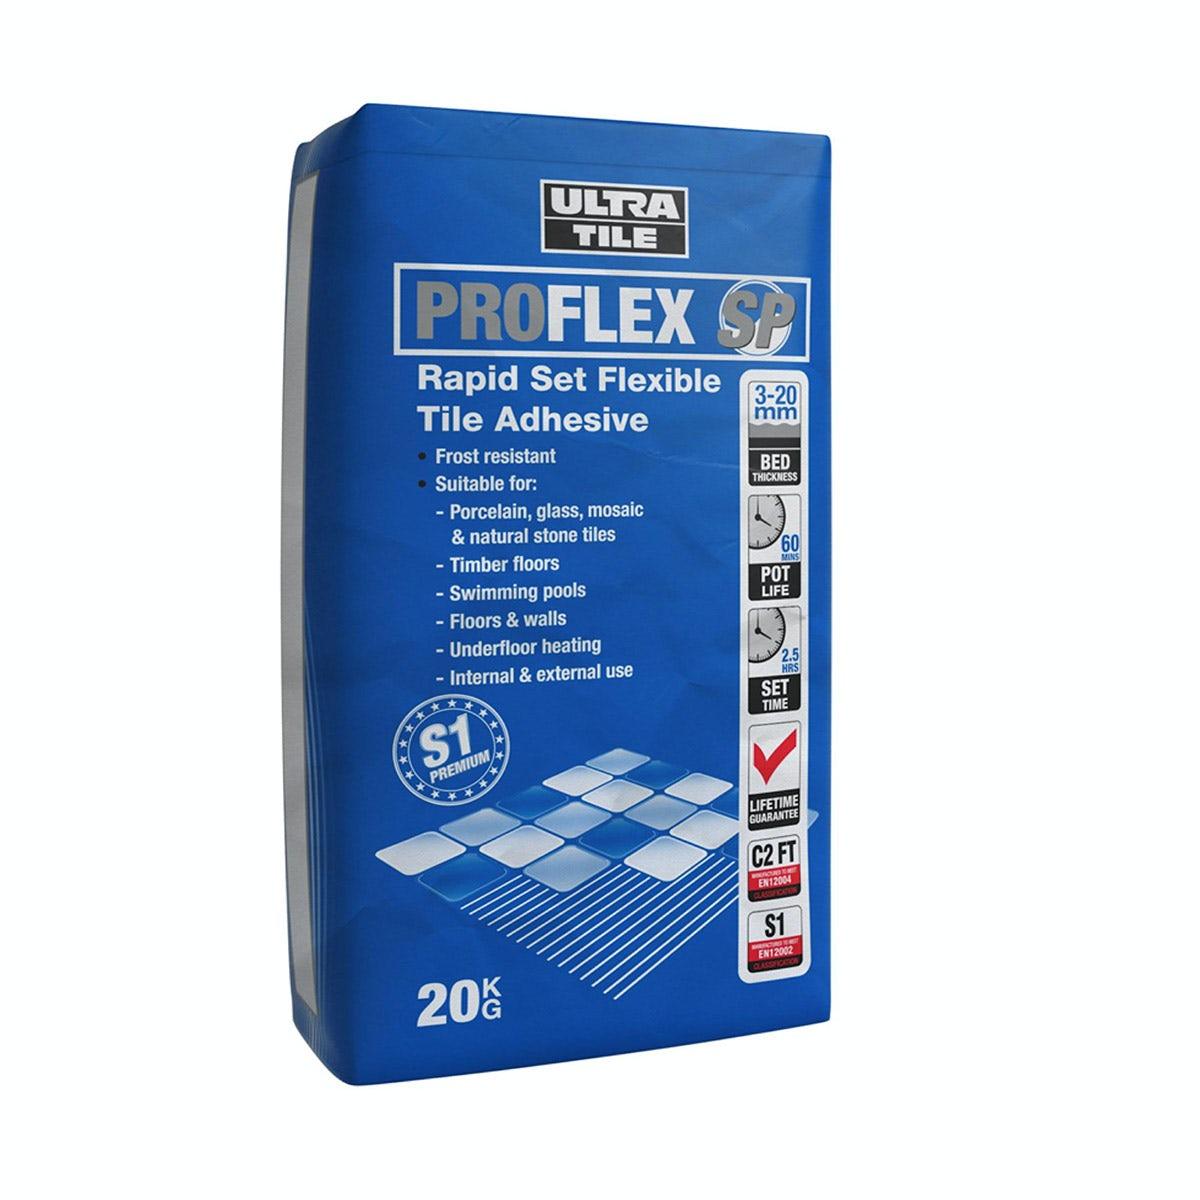 Ultra Tile Pro Flex Rapid Set Wall And Floor Tile Adhesive